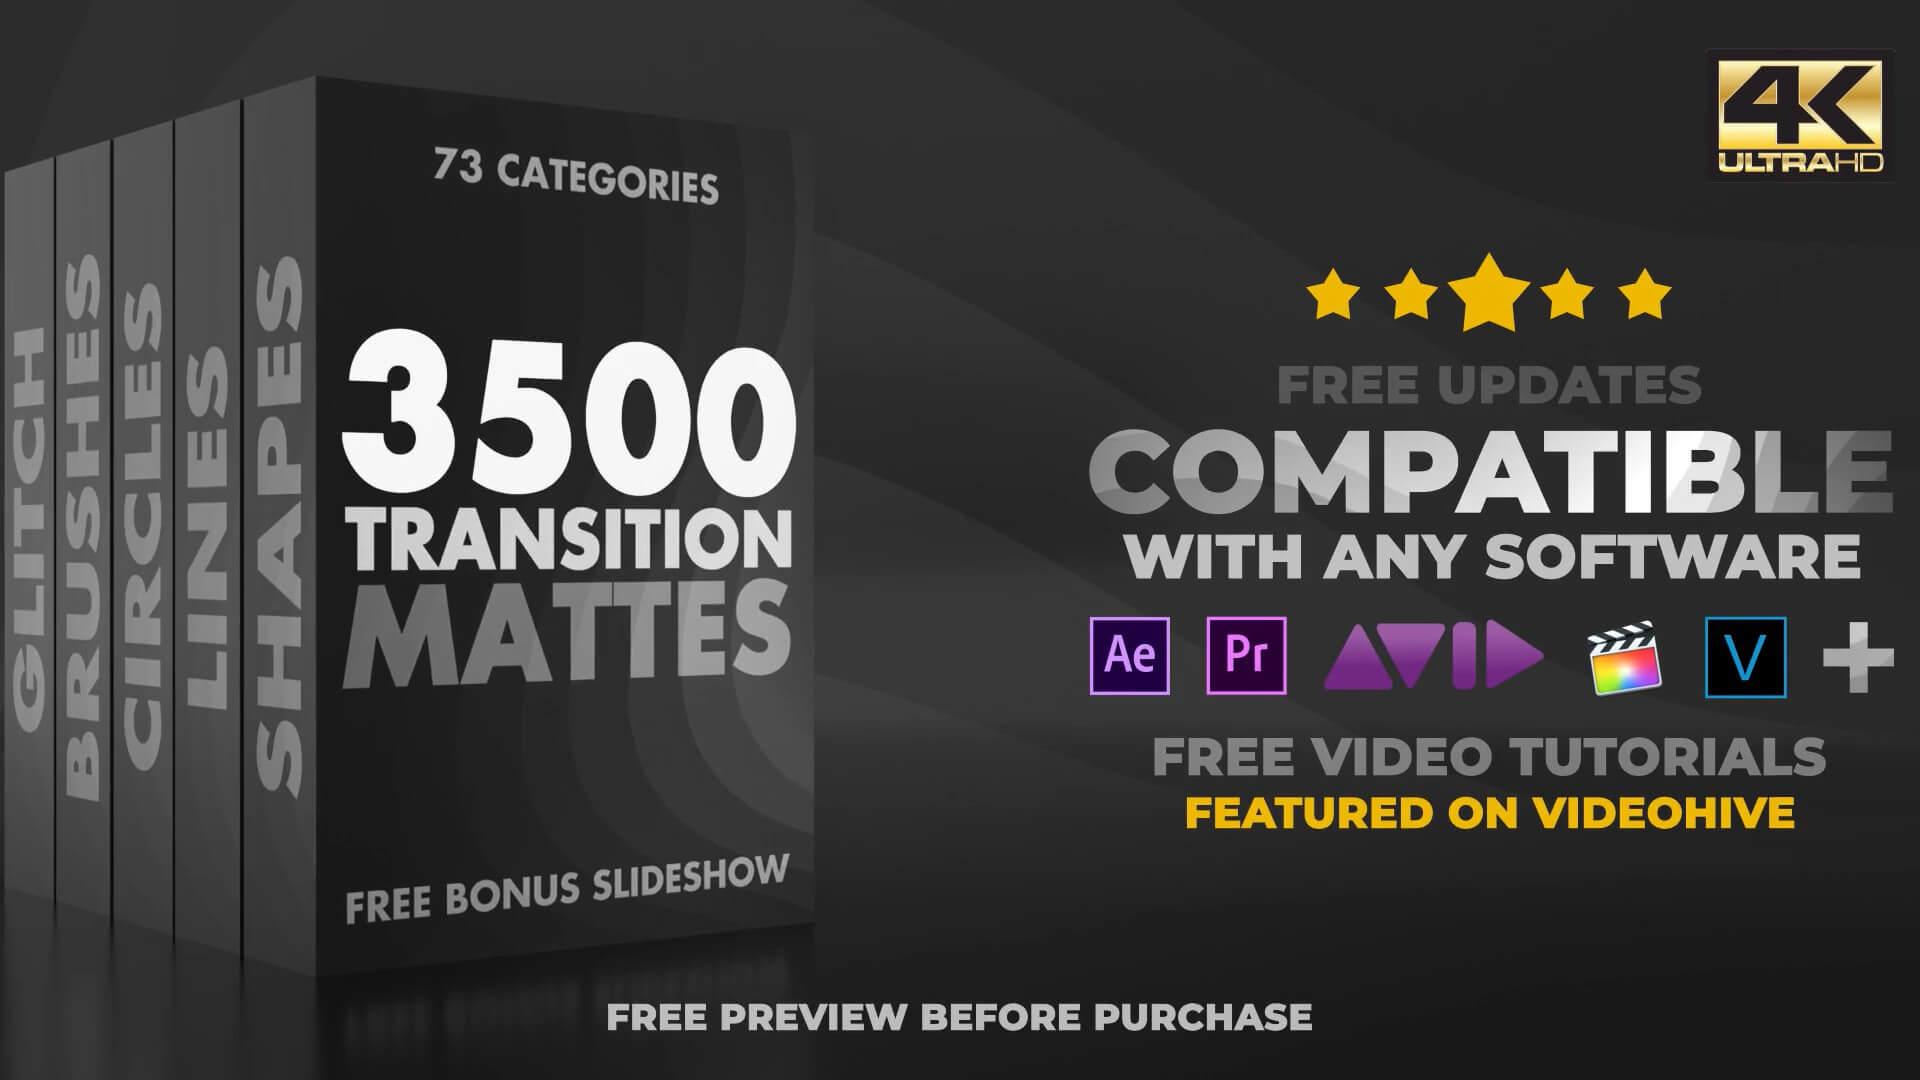 4K转场集合包 3500个流行转场 MP4格式适用各类视频软件